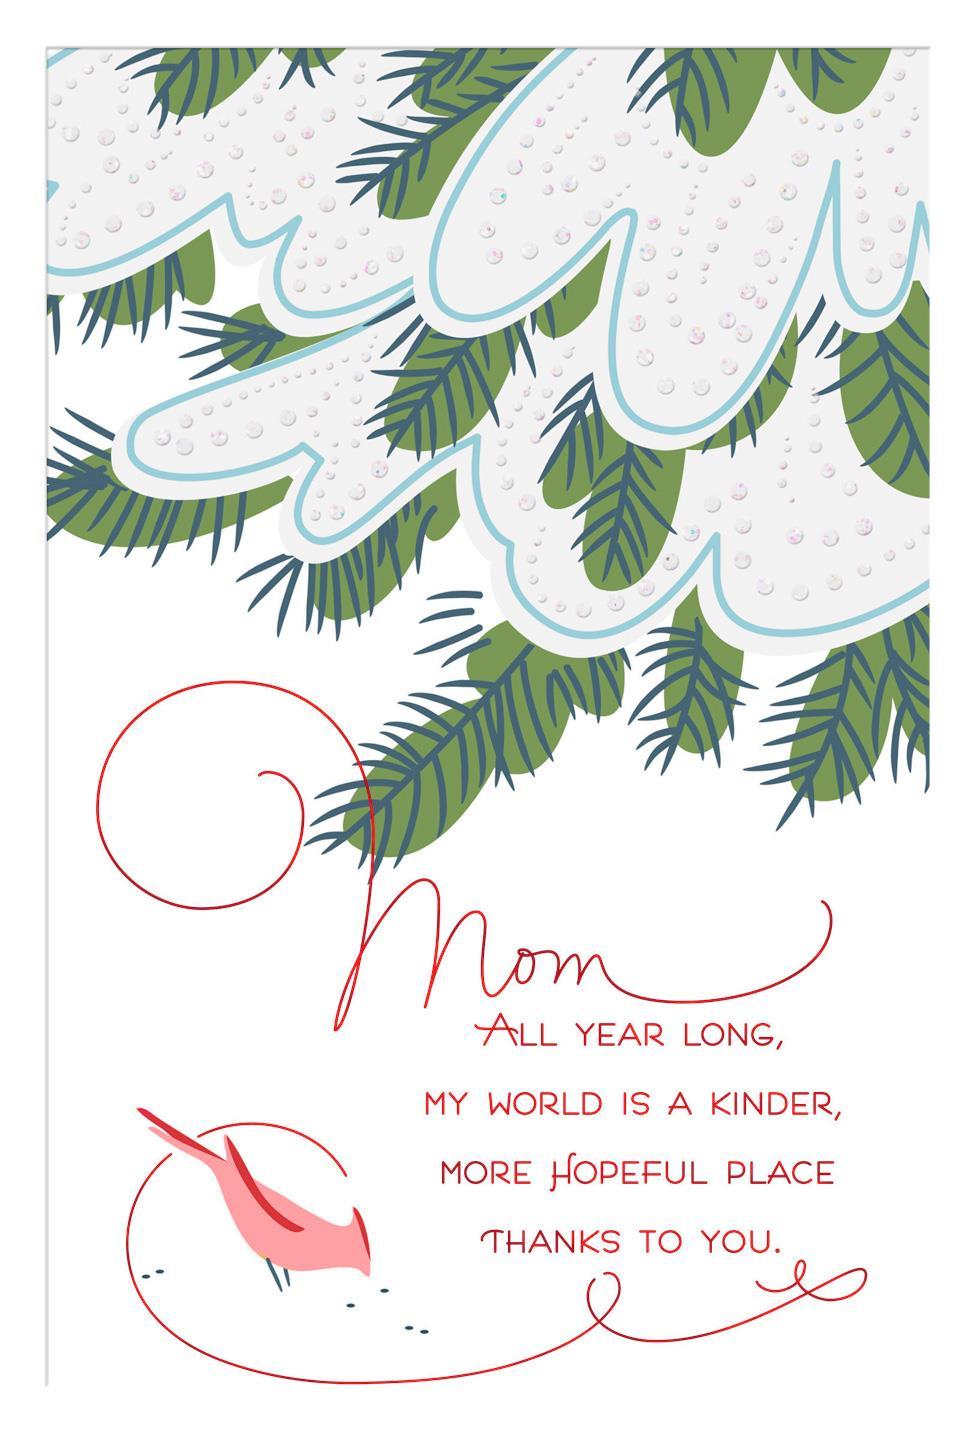 Christmas card for mom nemetasfgegabeltfo bird and evergreen christmas card for mom m4hsunfo